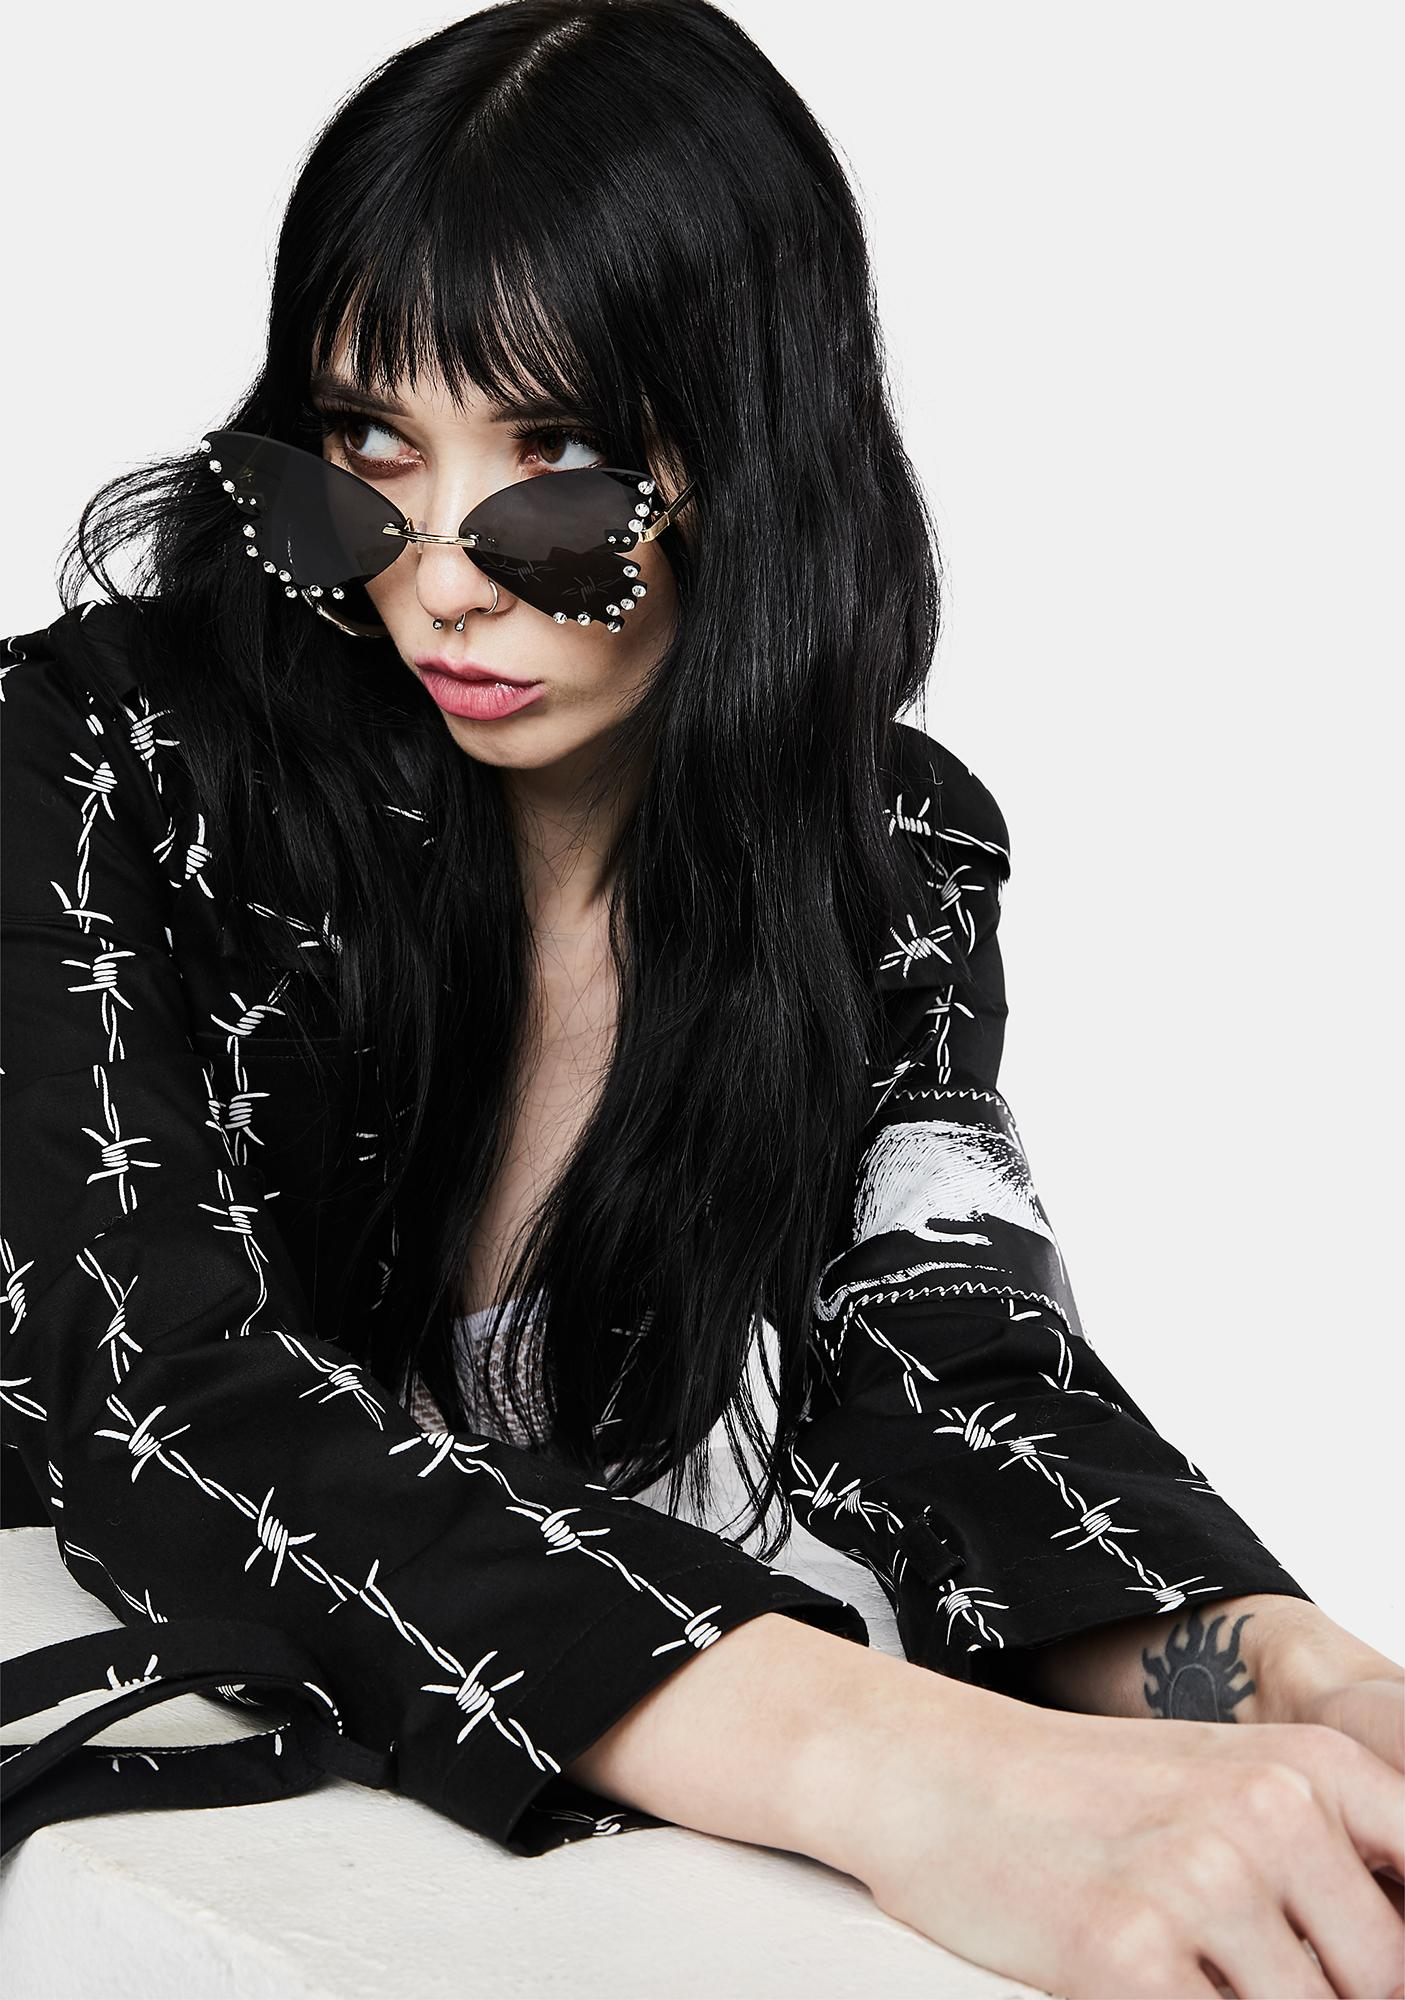 Noir Cutie Pie Rhinestone Sunglasses